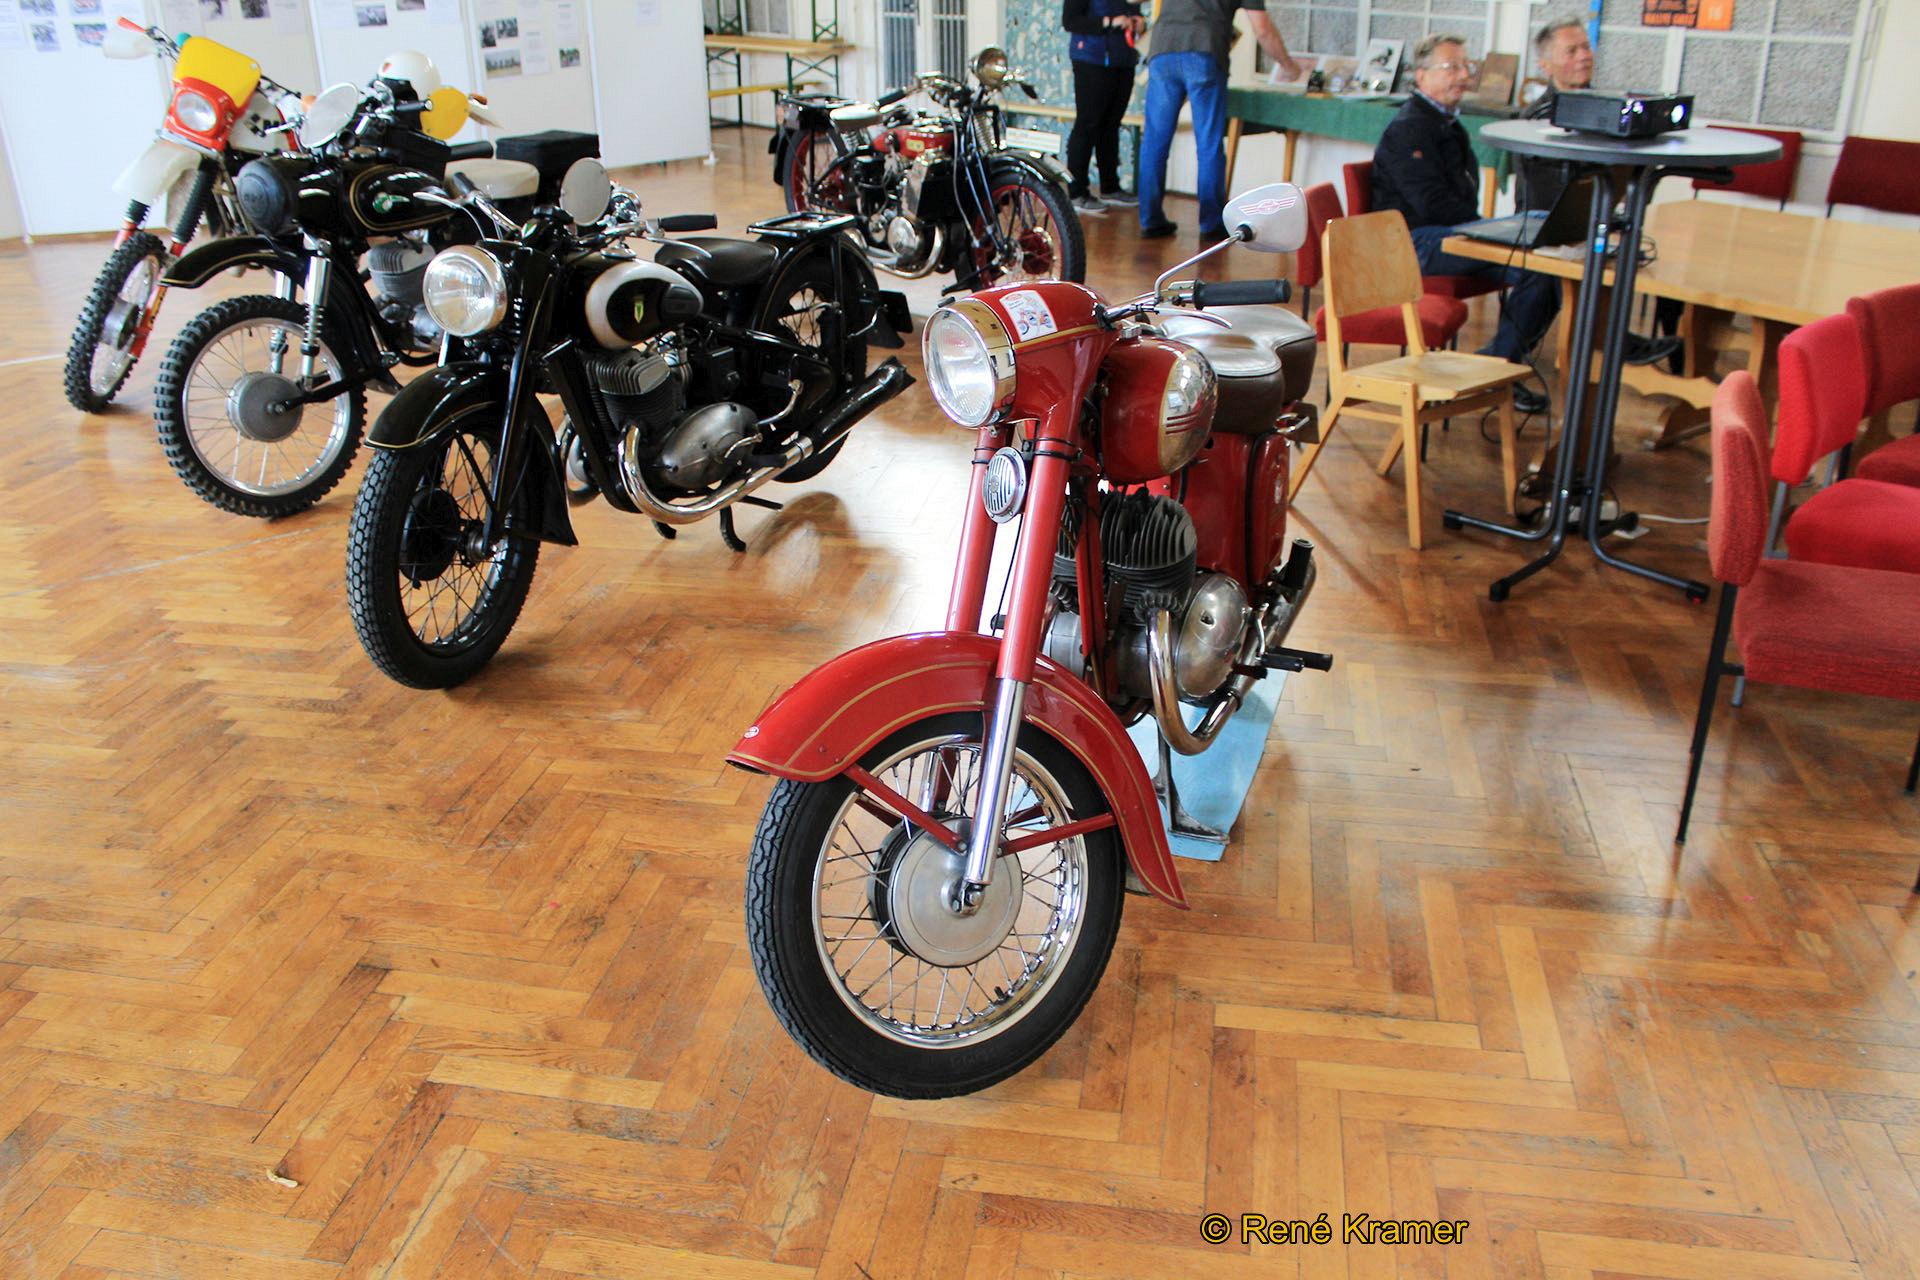 MC Greiz feiert mit Ausstellung 60-jährigen Bestehens.